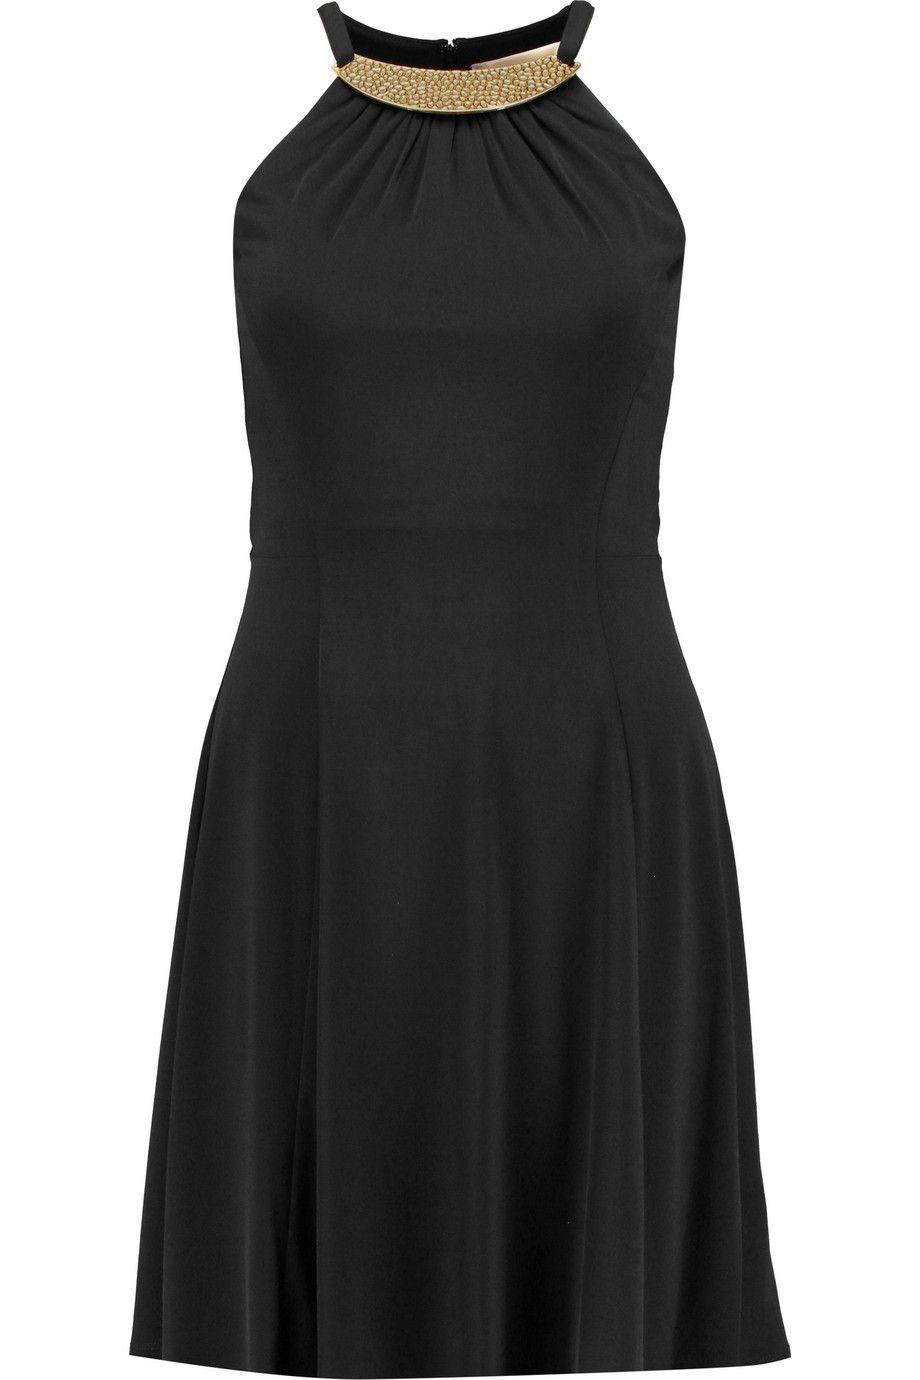 MICHAEL MICHAEL KORS Embellished Stretch-Jersey Dress. #michaelmichaelkors #cloth #dress